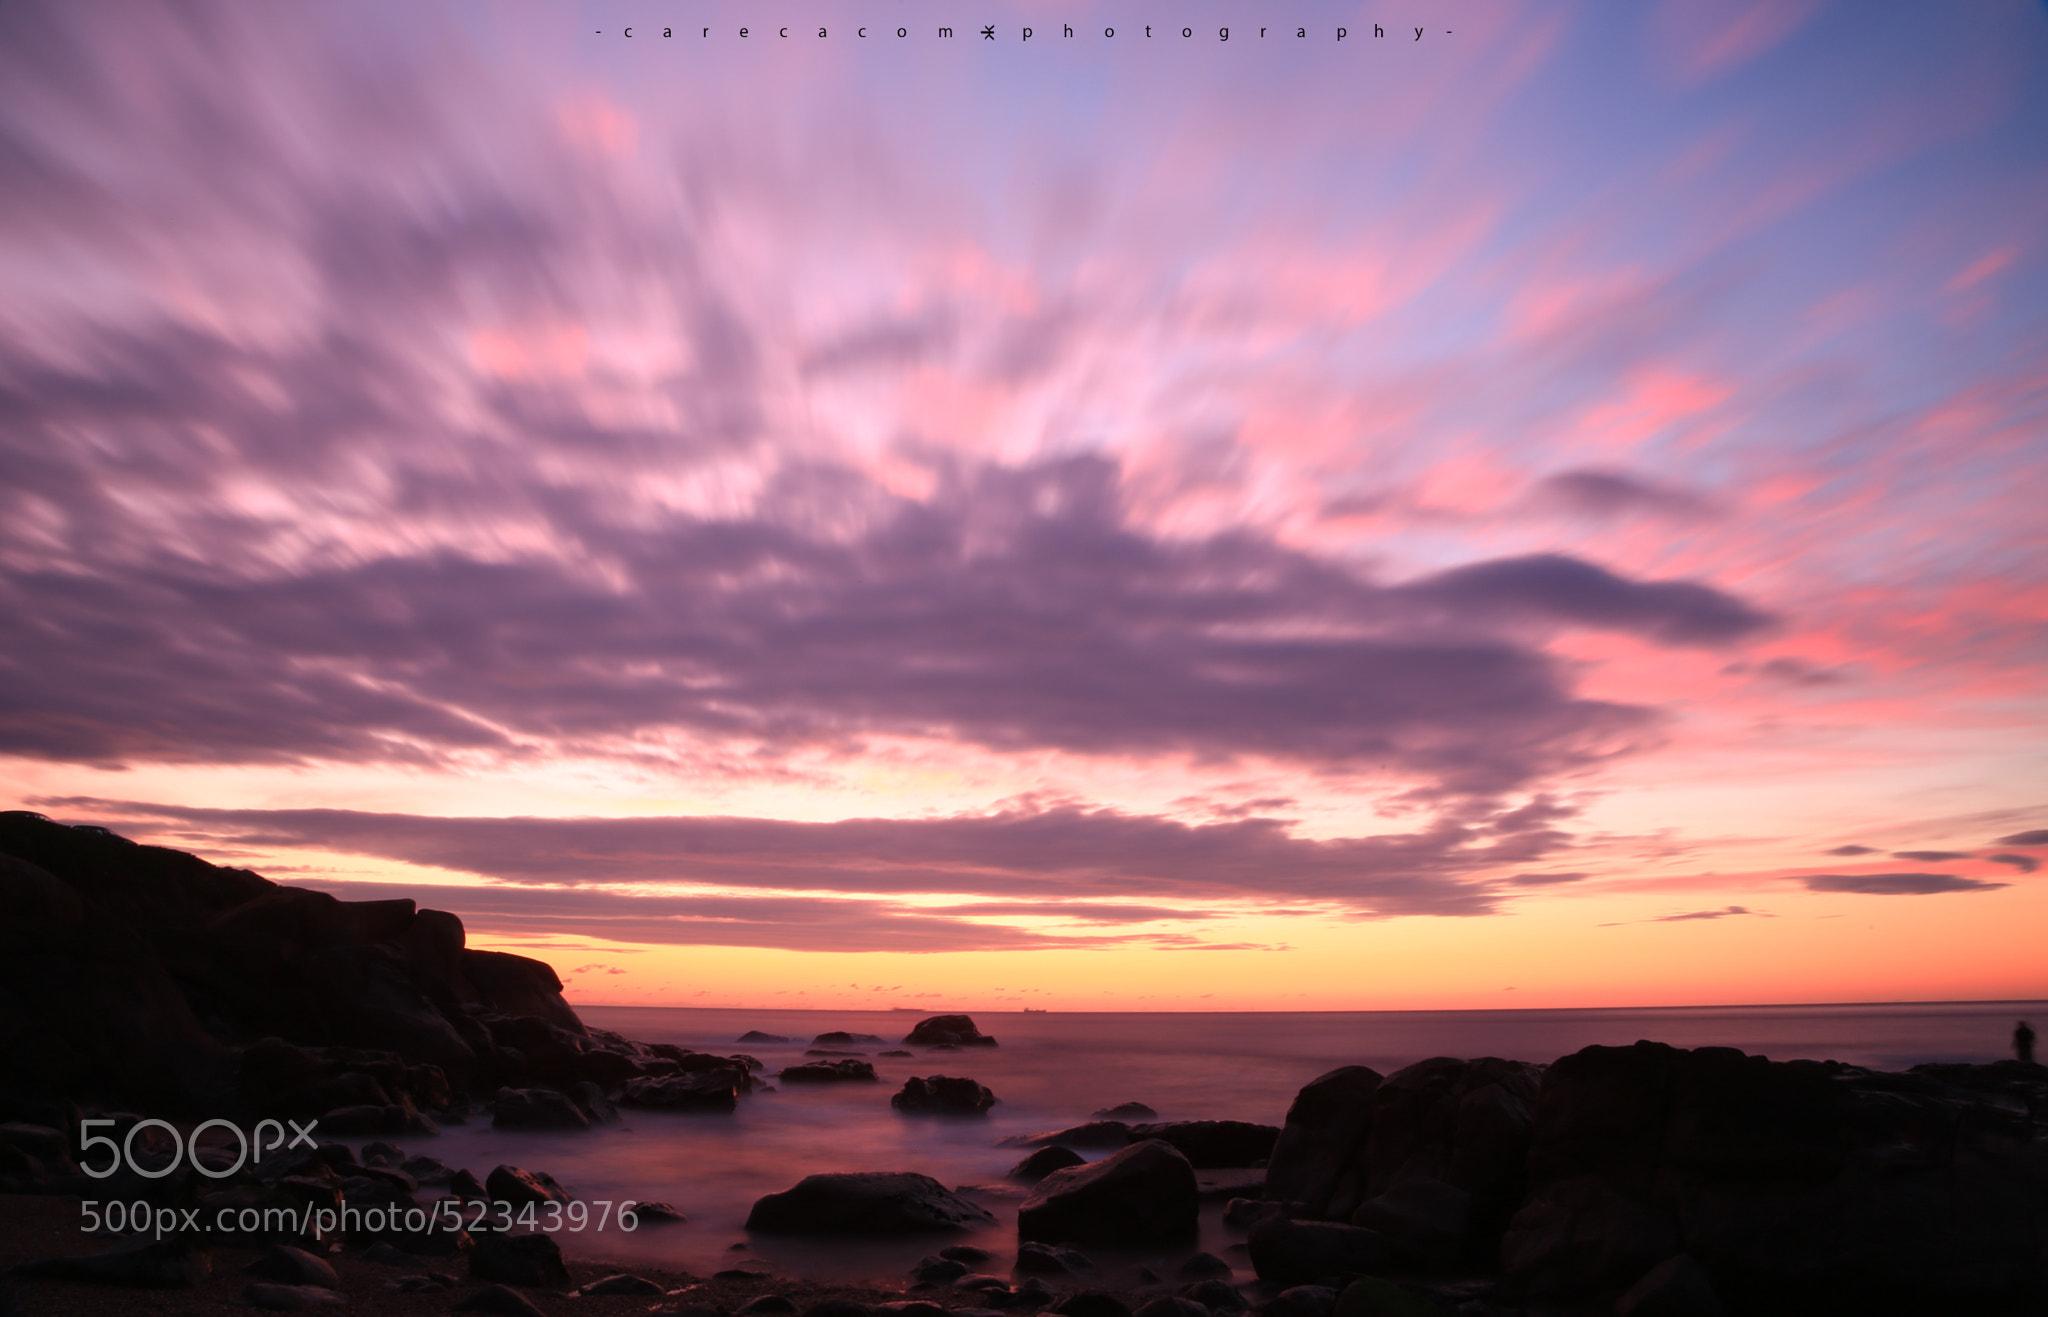 Photograph sunset_cabedelo by Careca Com K on 500px